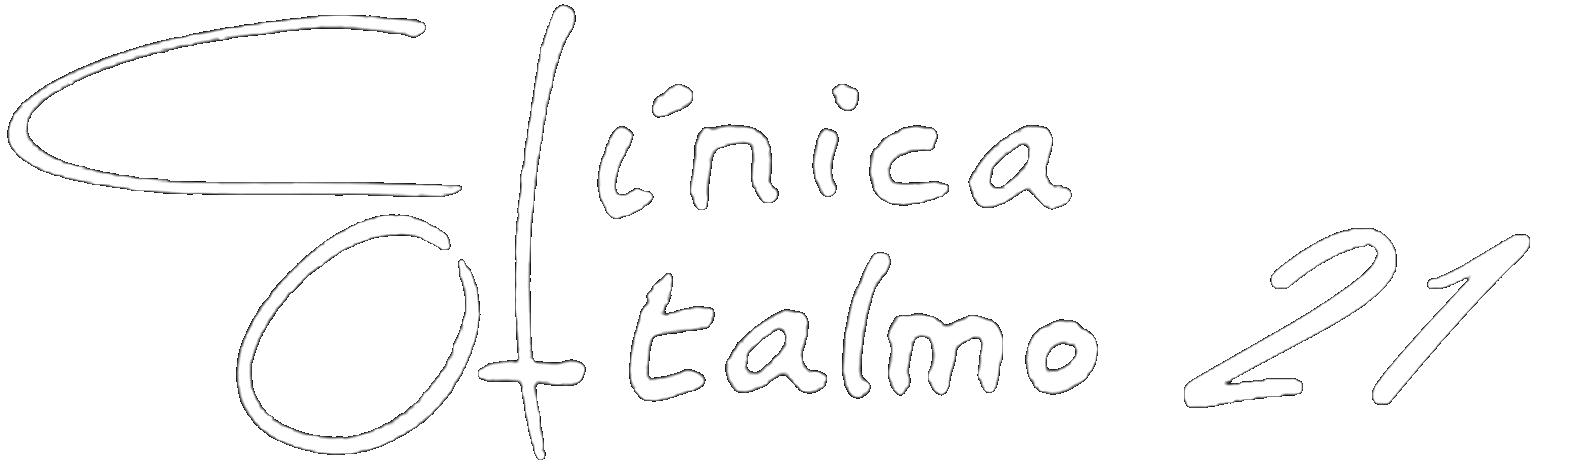 Clínica Doctor Maldonado